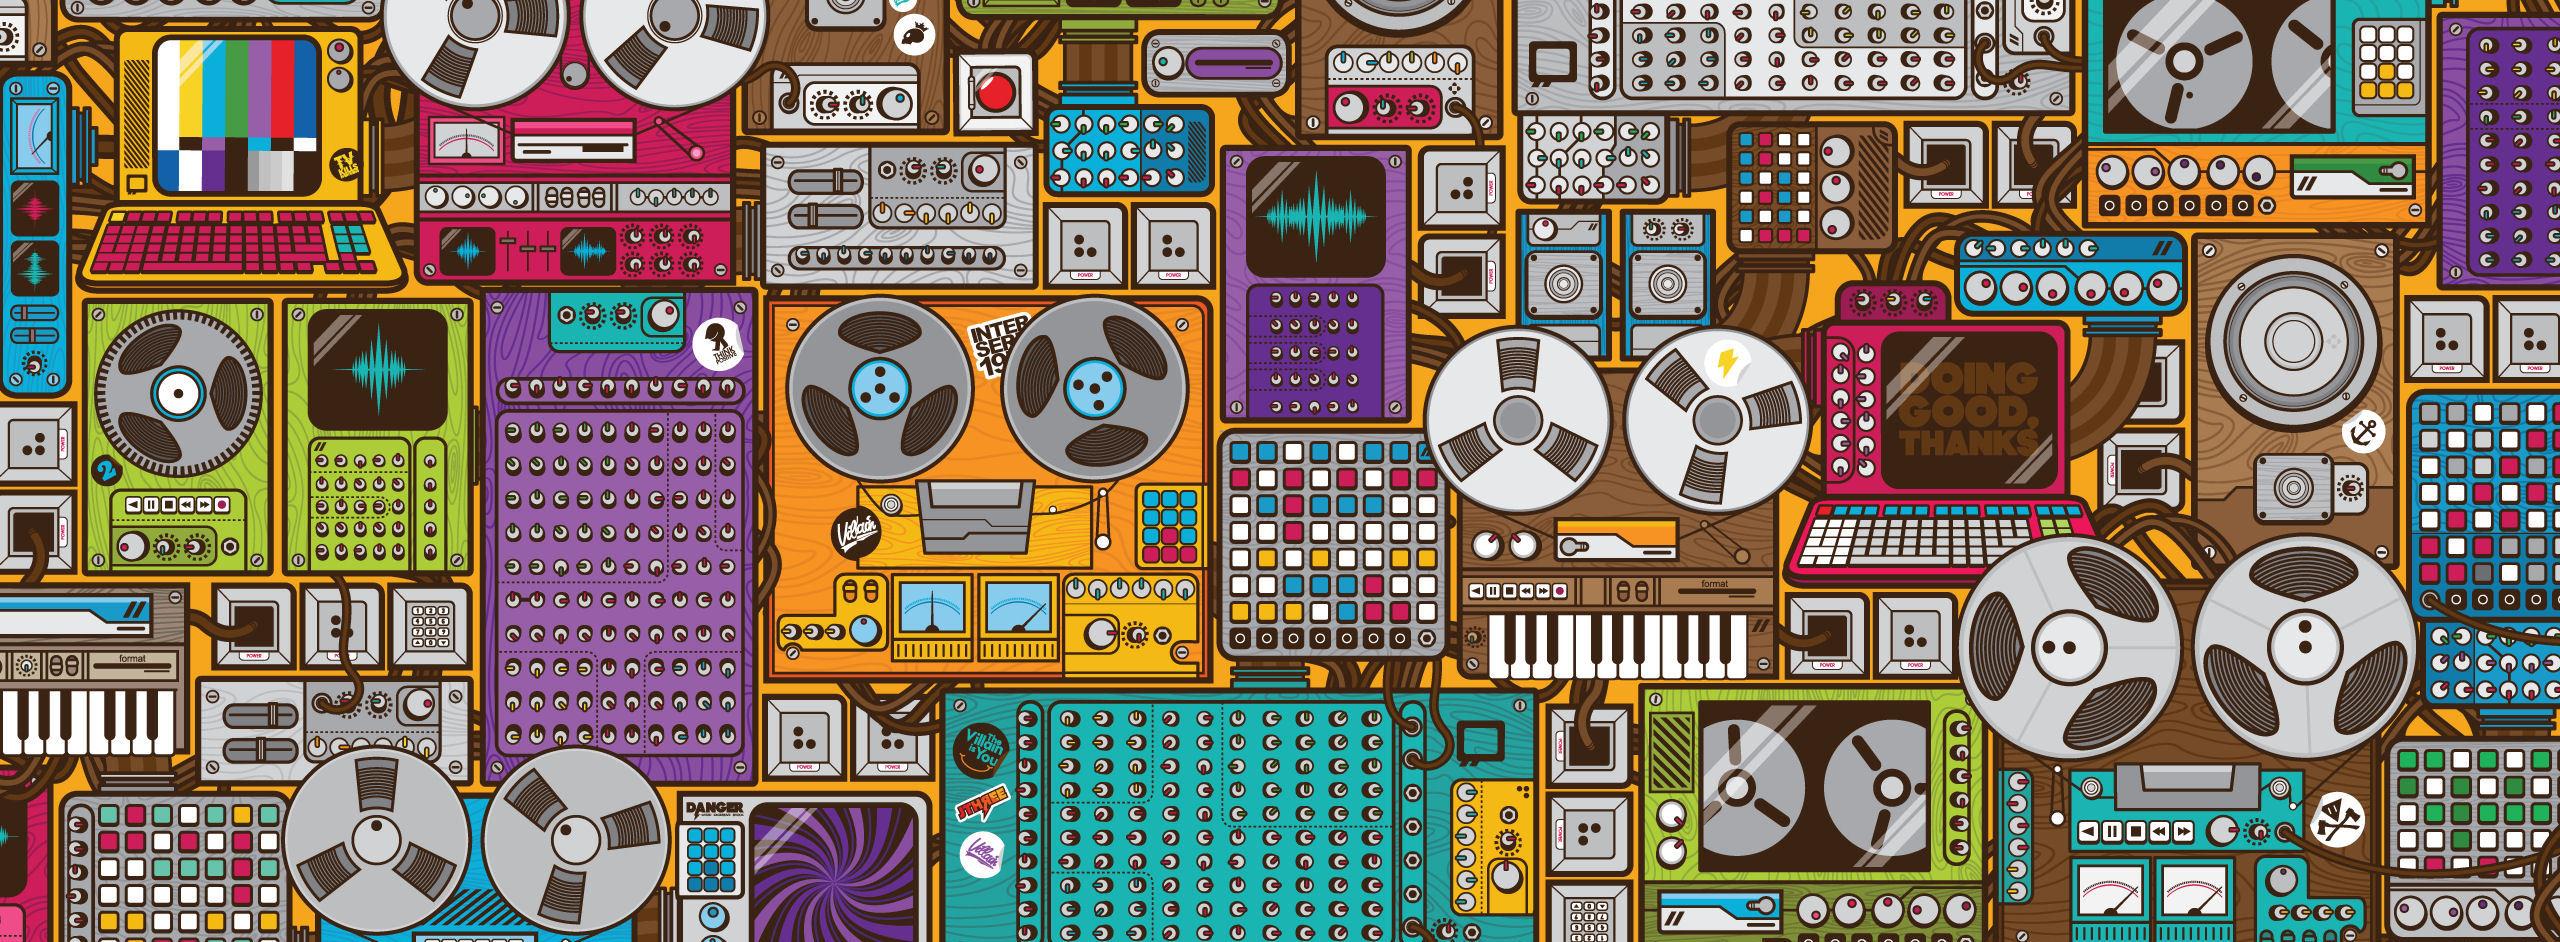 Recording-equalizer_00266037